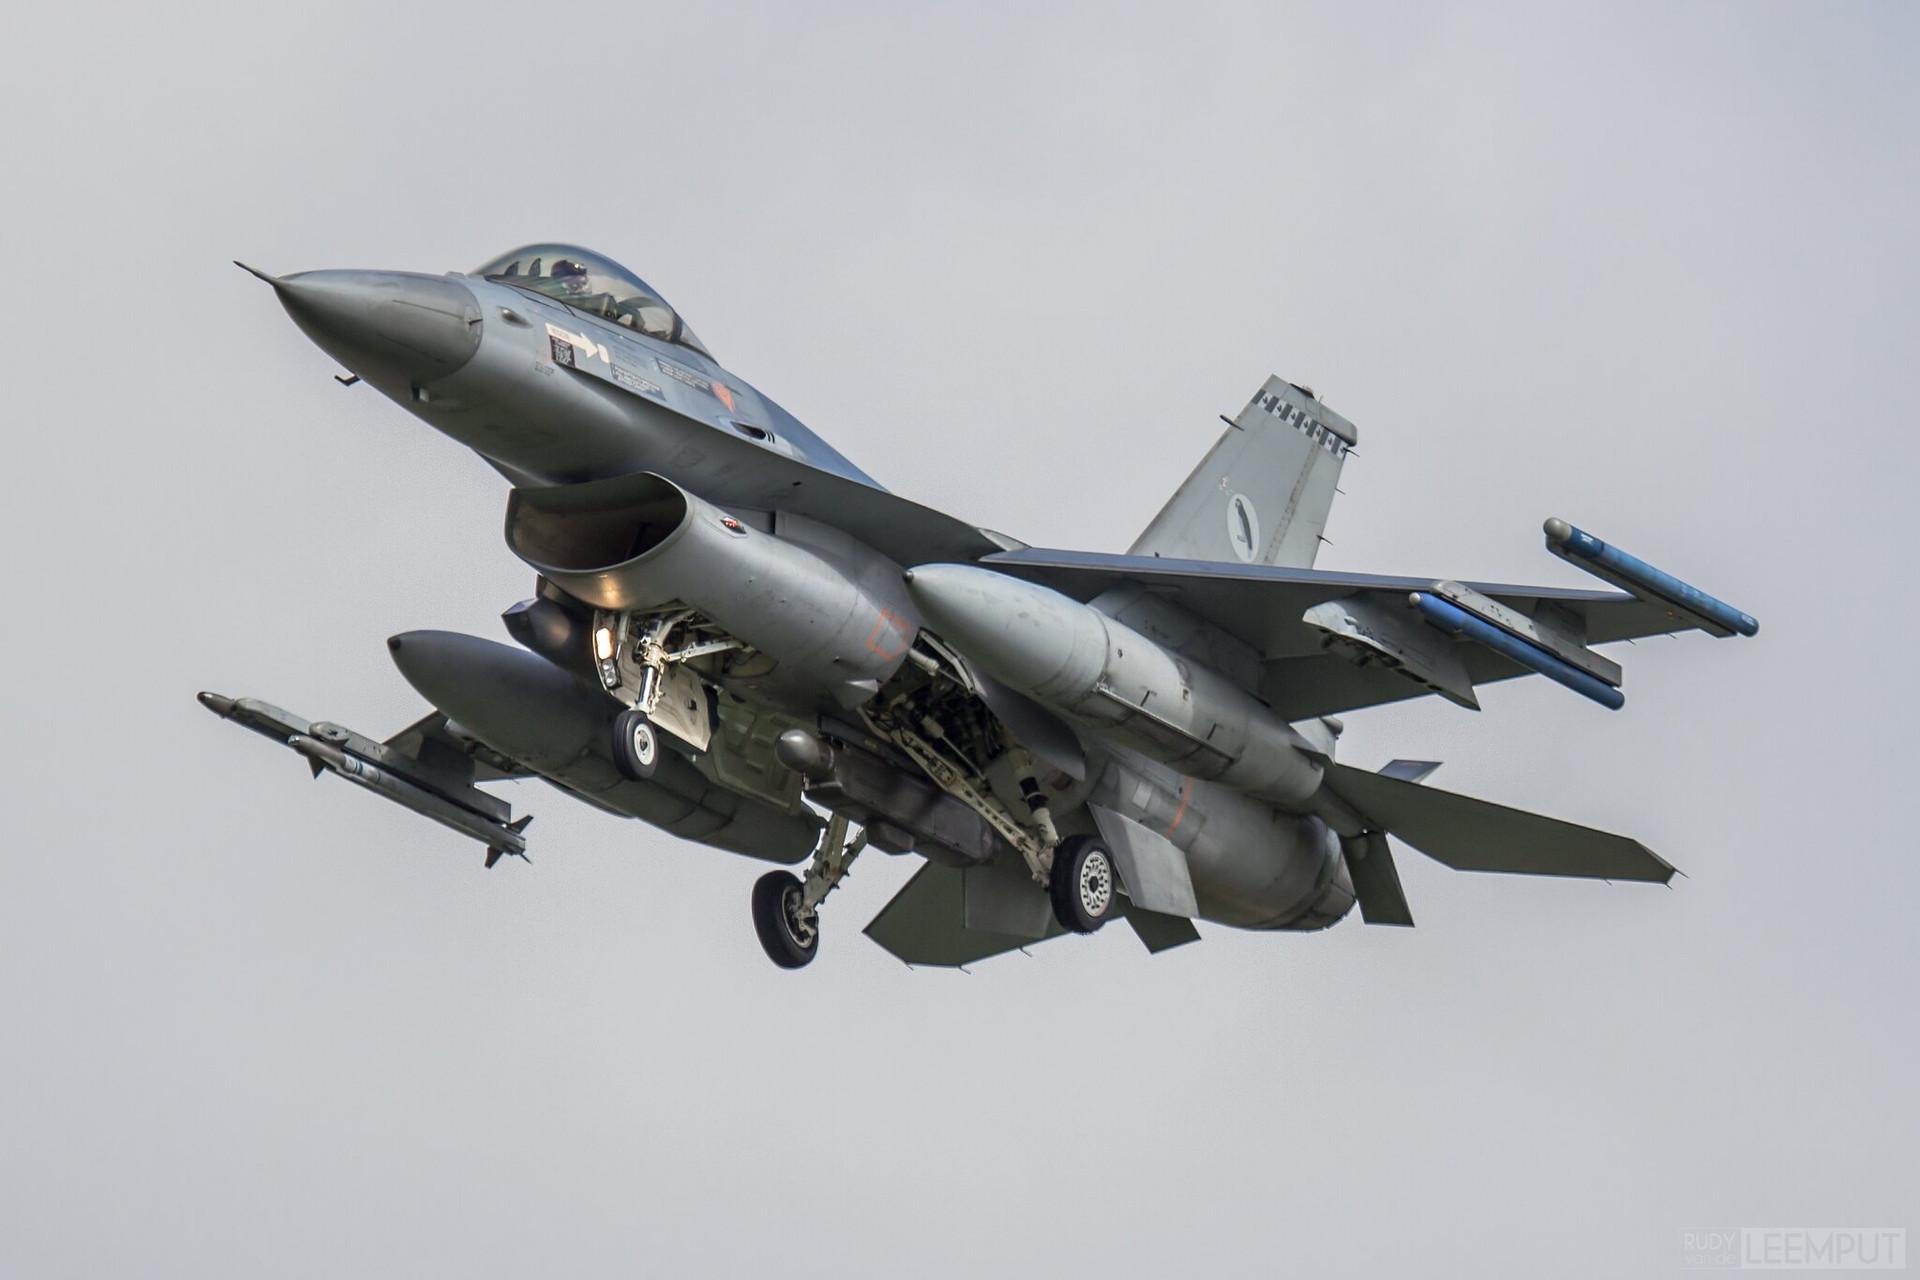 J-628   Build: 1983 - Lockheed F-16 A Fighting Falcon